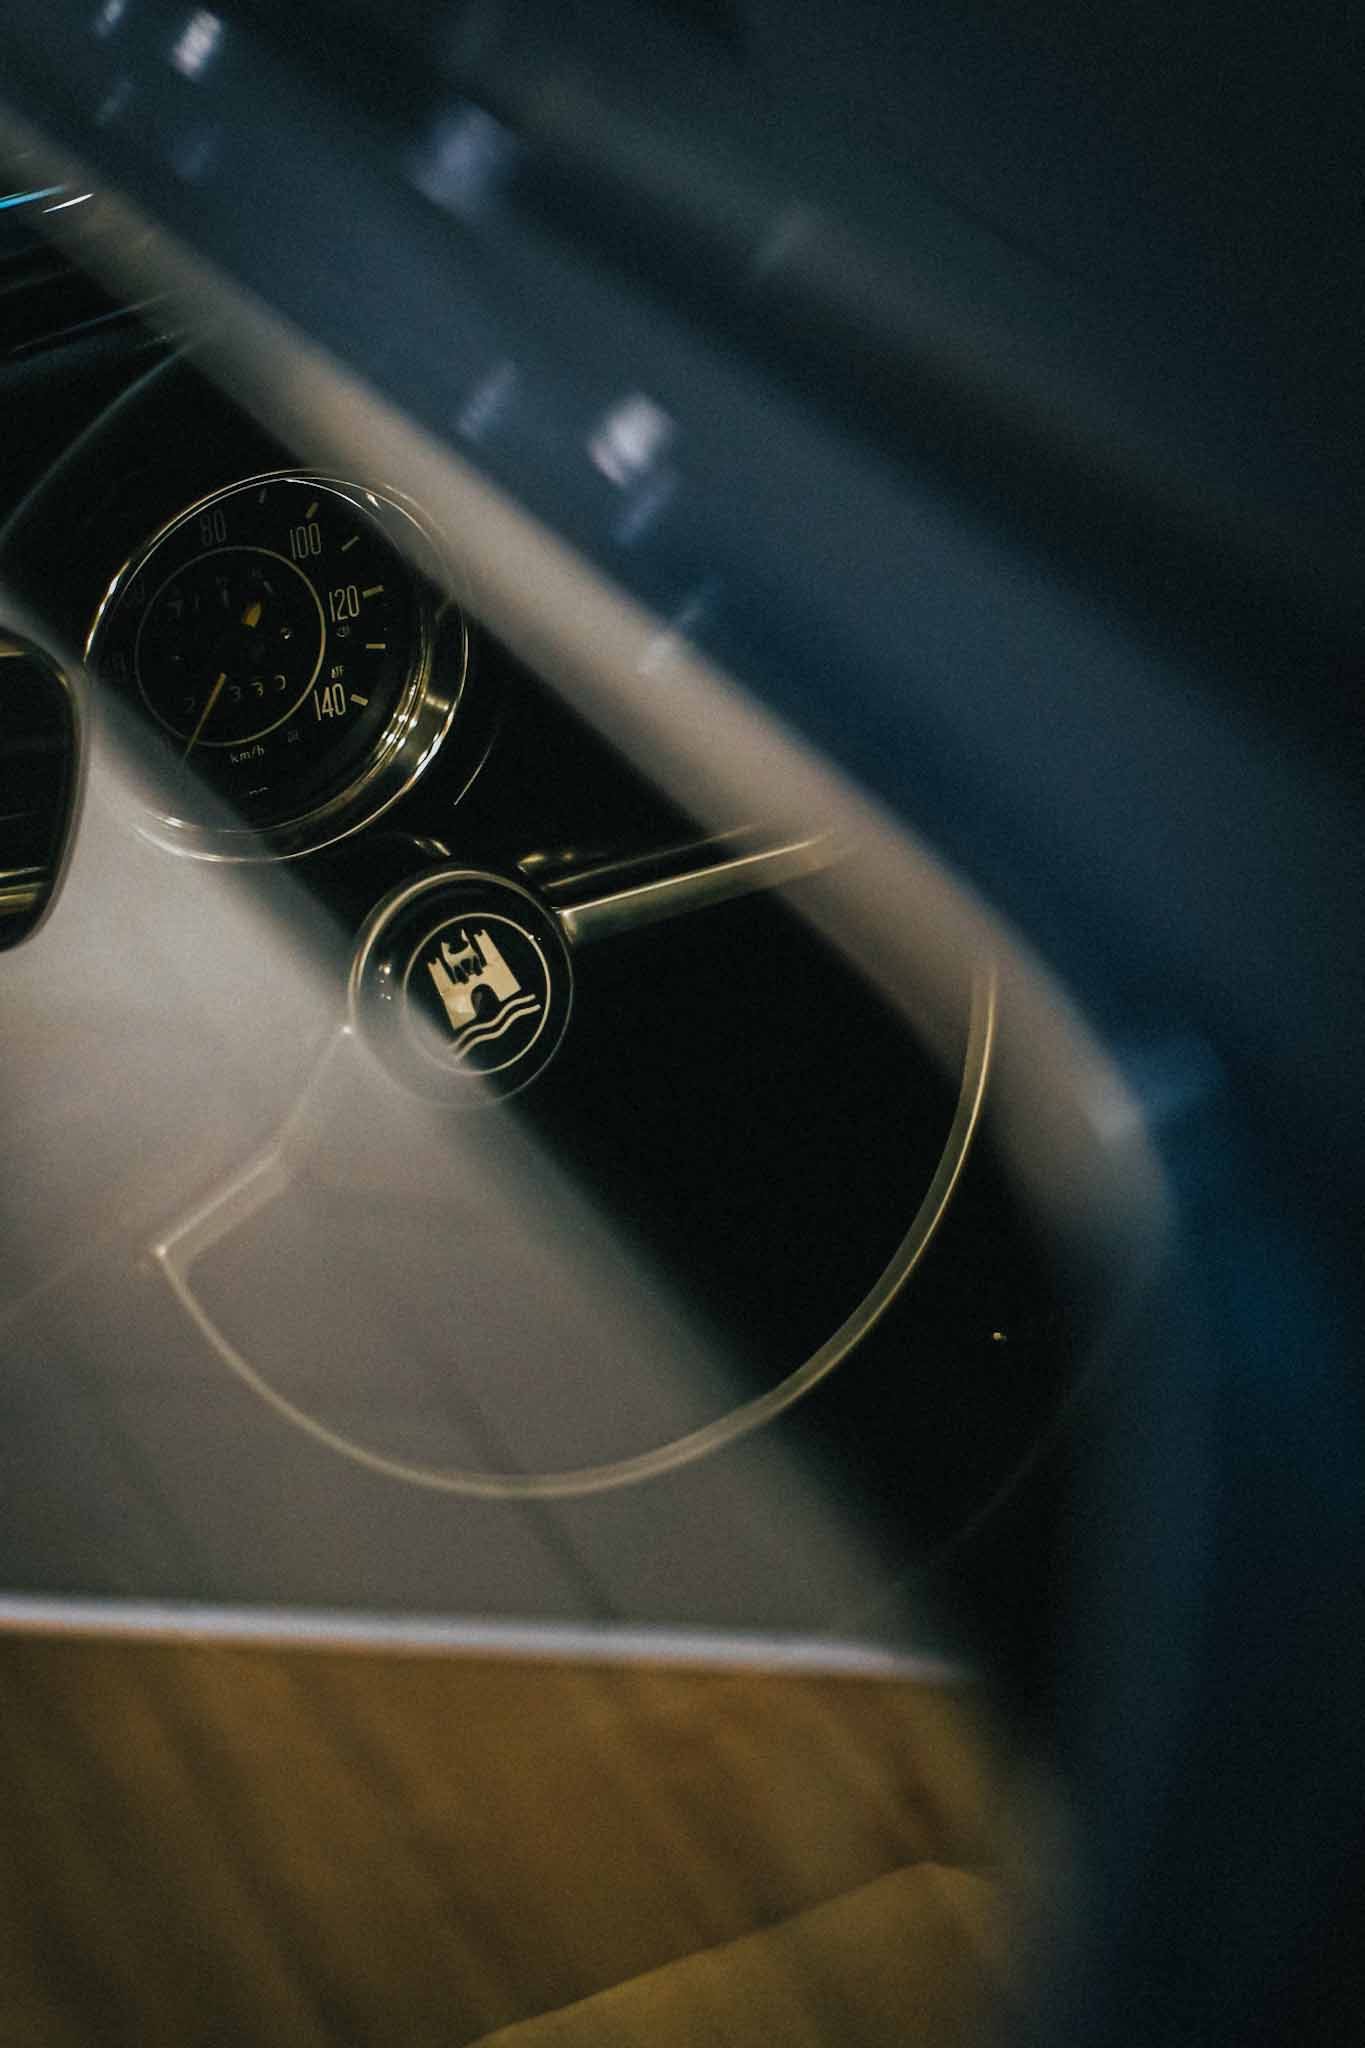 VW bubbla norrbil Norrtälje